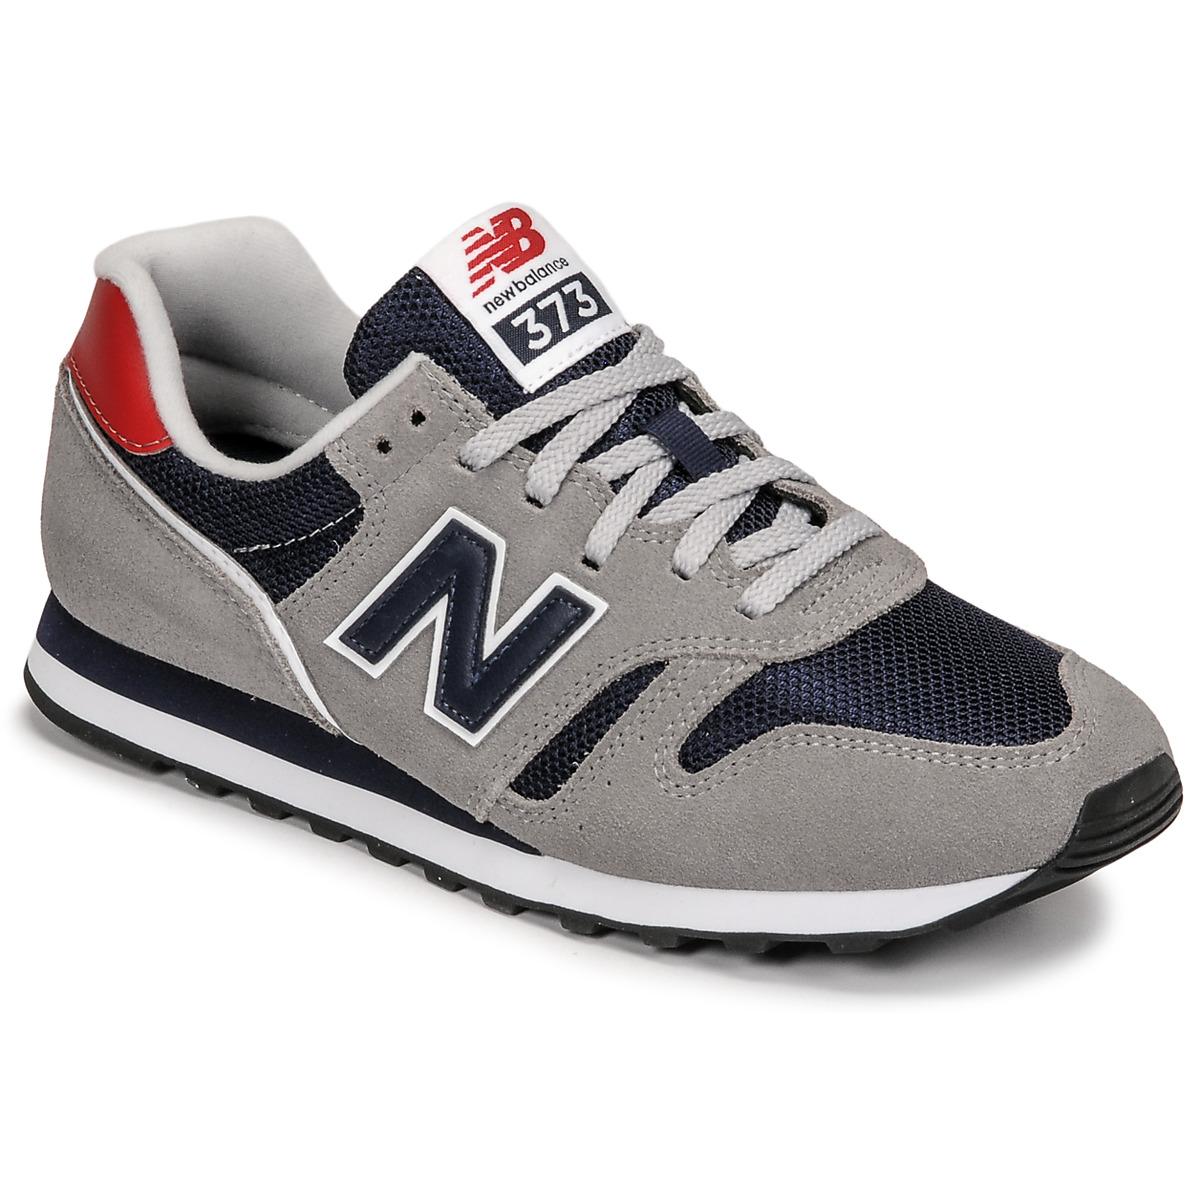 New Balance 373 Uomo 18751255 Consegna Gratuita